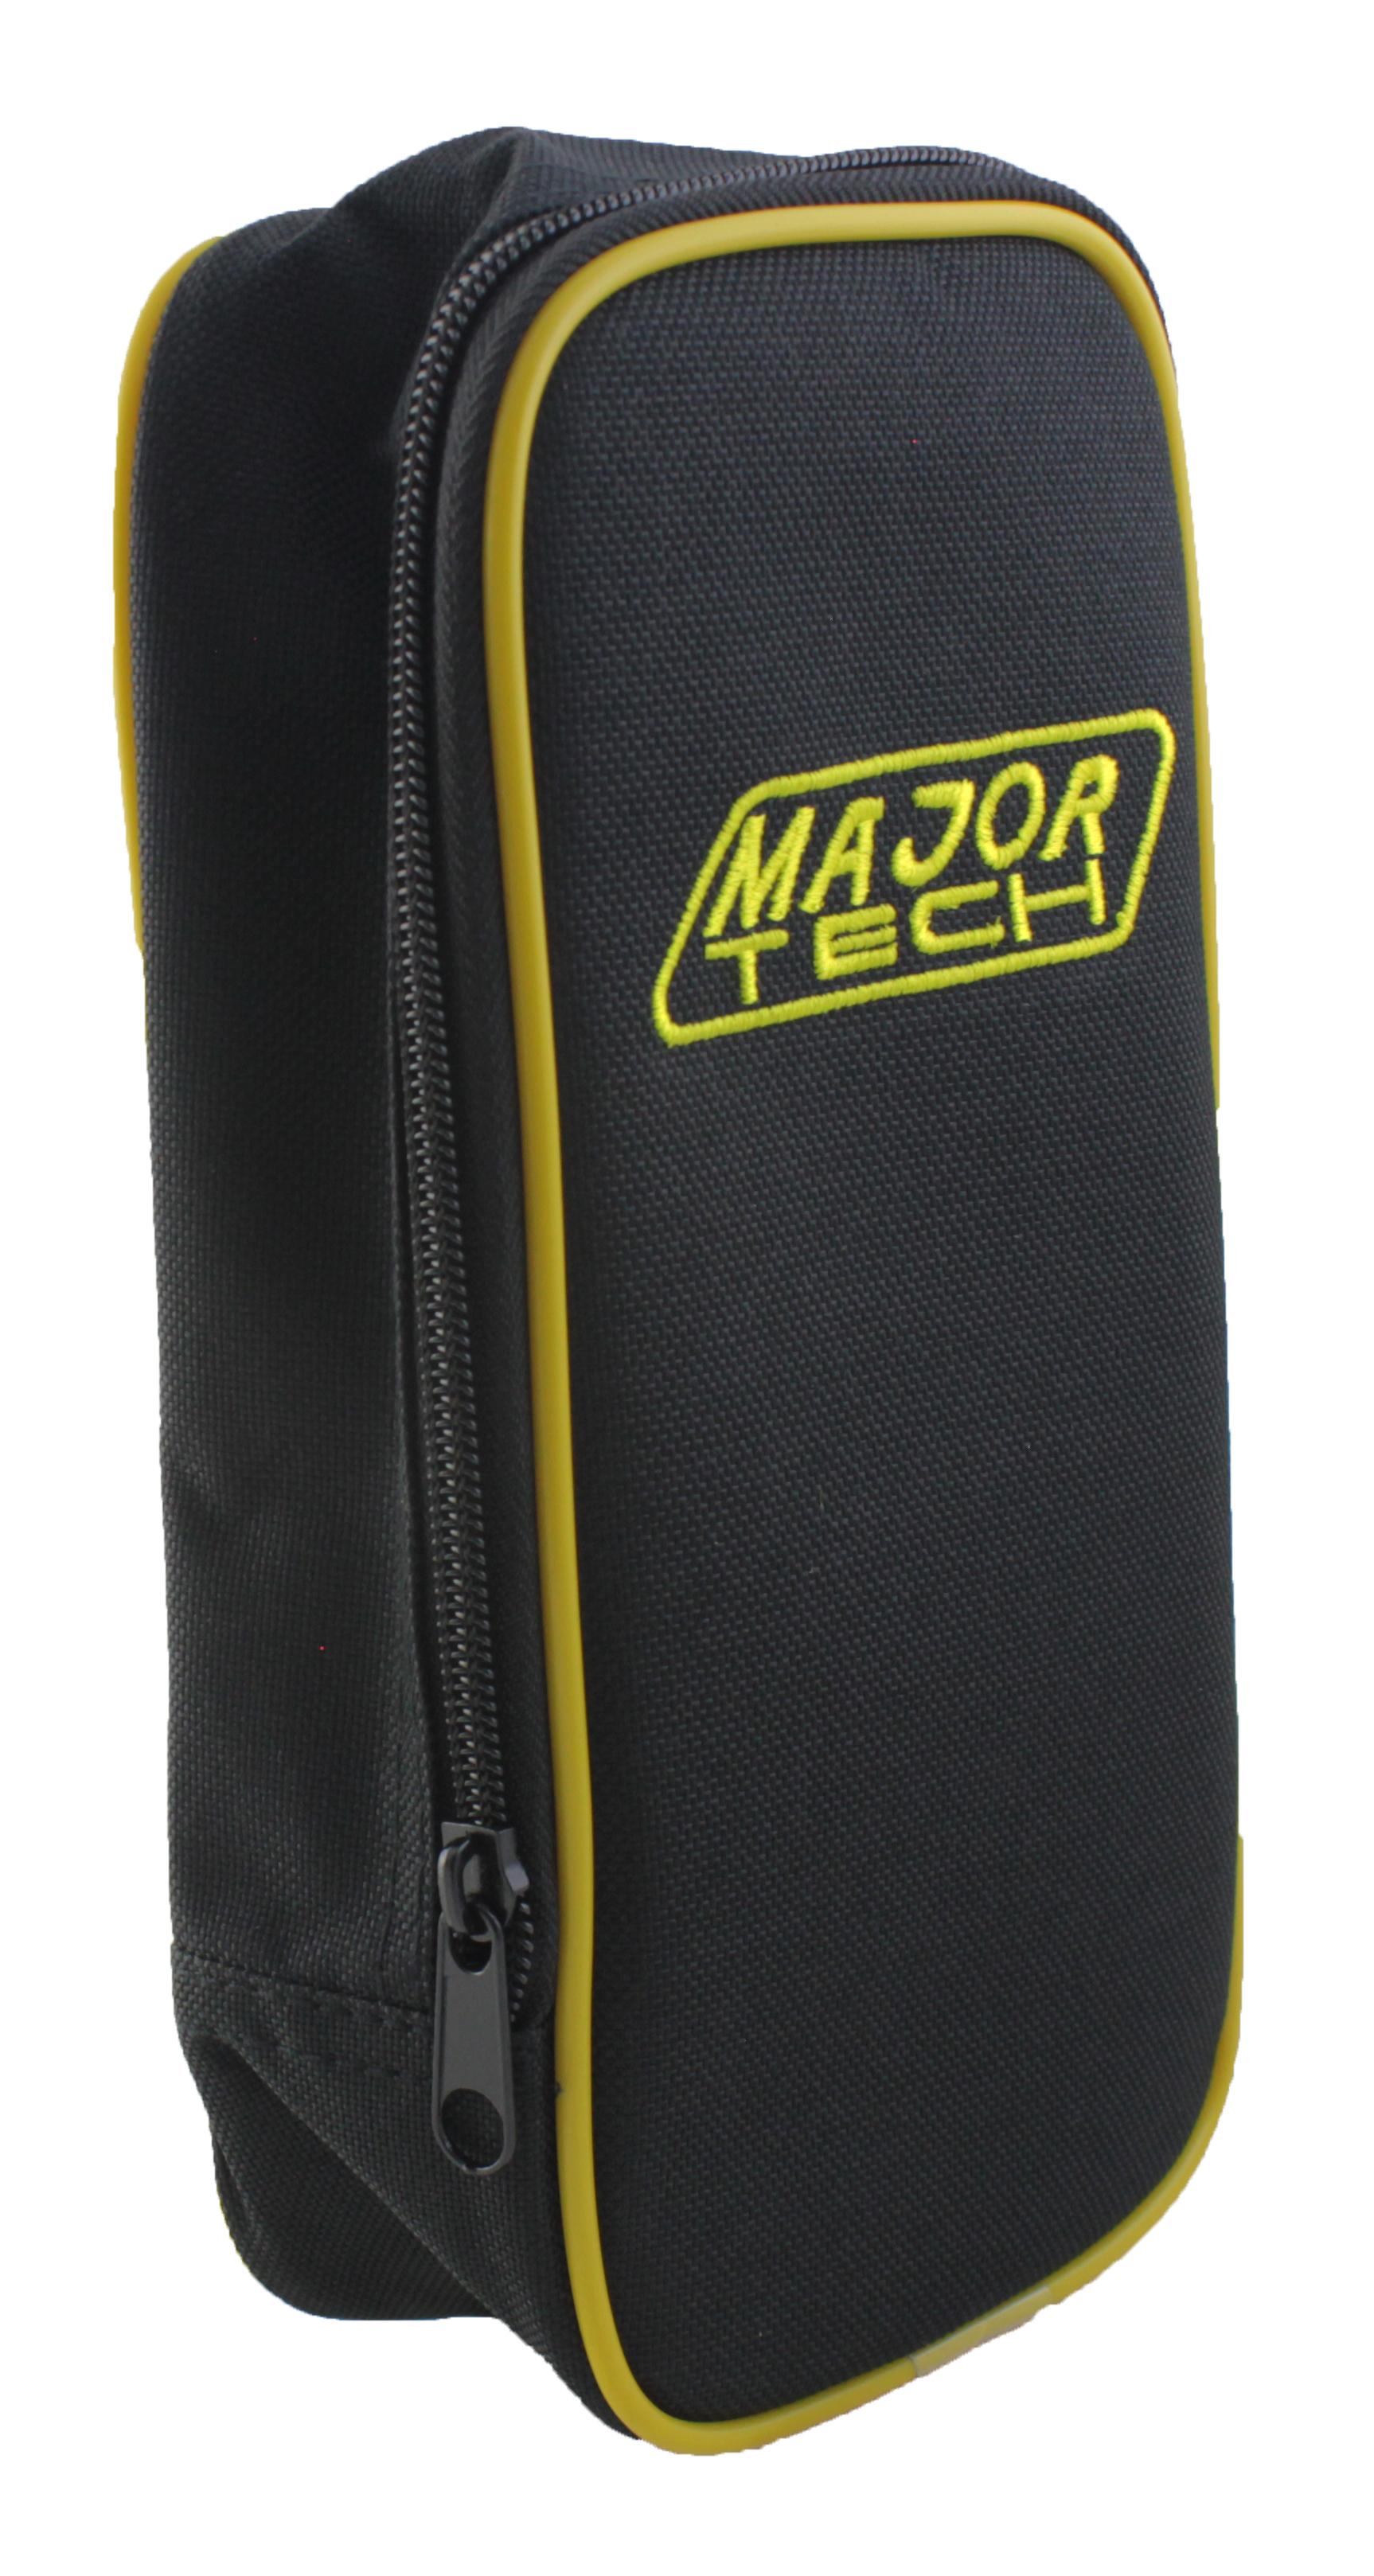 Large Digital Multimeter Carrying Case (MT827) - Major Tech